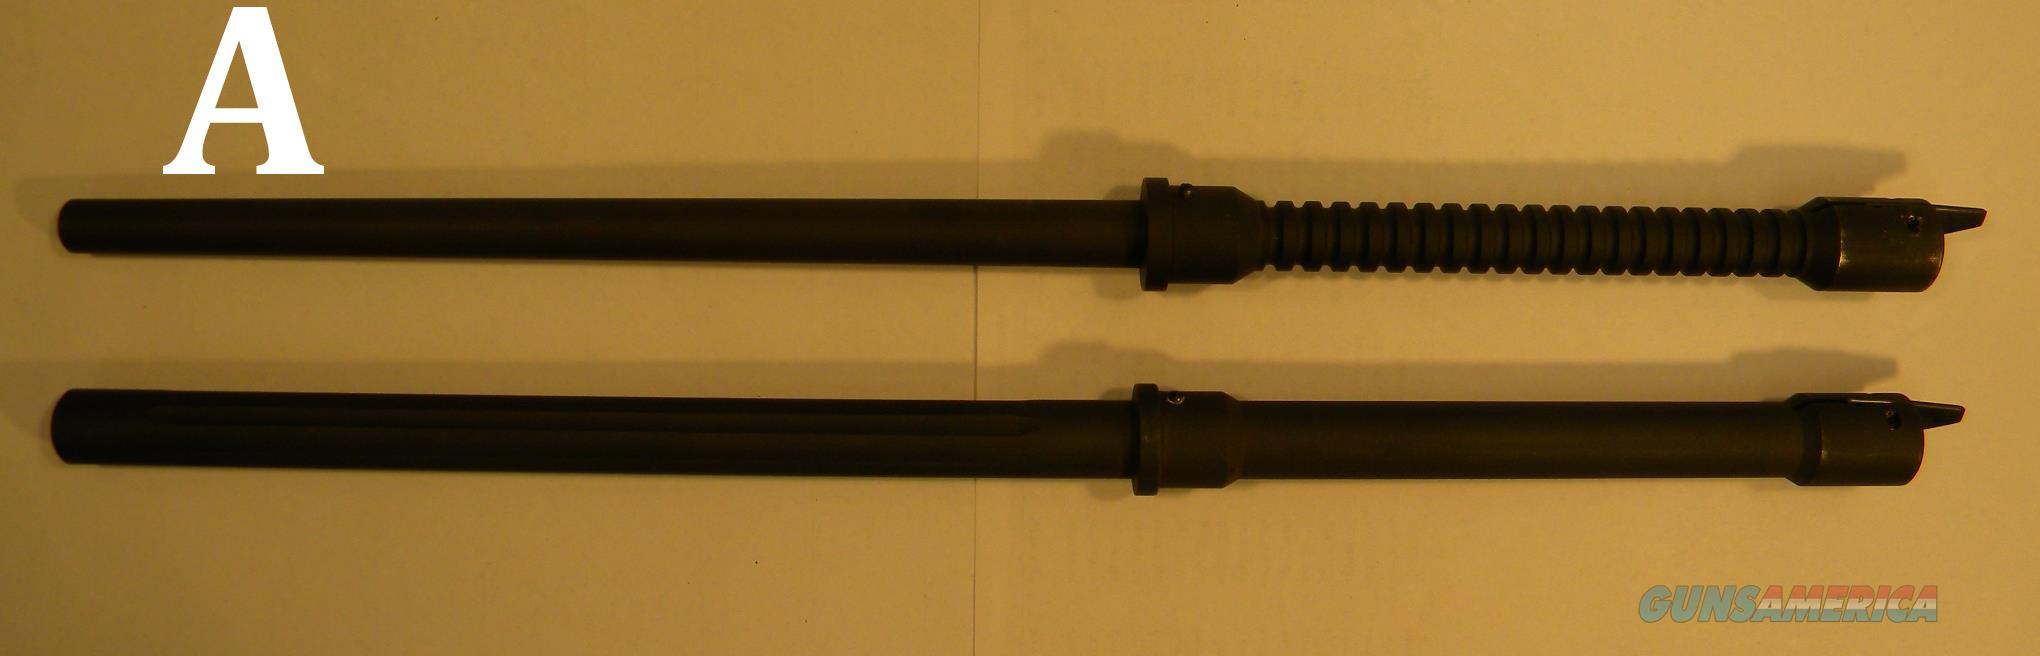 AWI/Eaton, Feather Firearms Parts:  .22 LR Barrels  Non-Guns > Gun Parts > Misc > Rifles